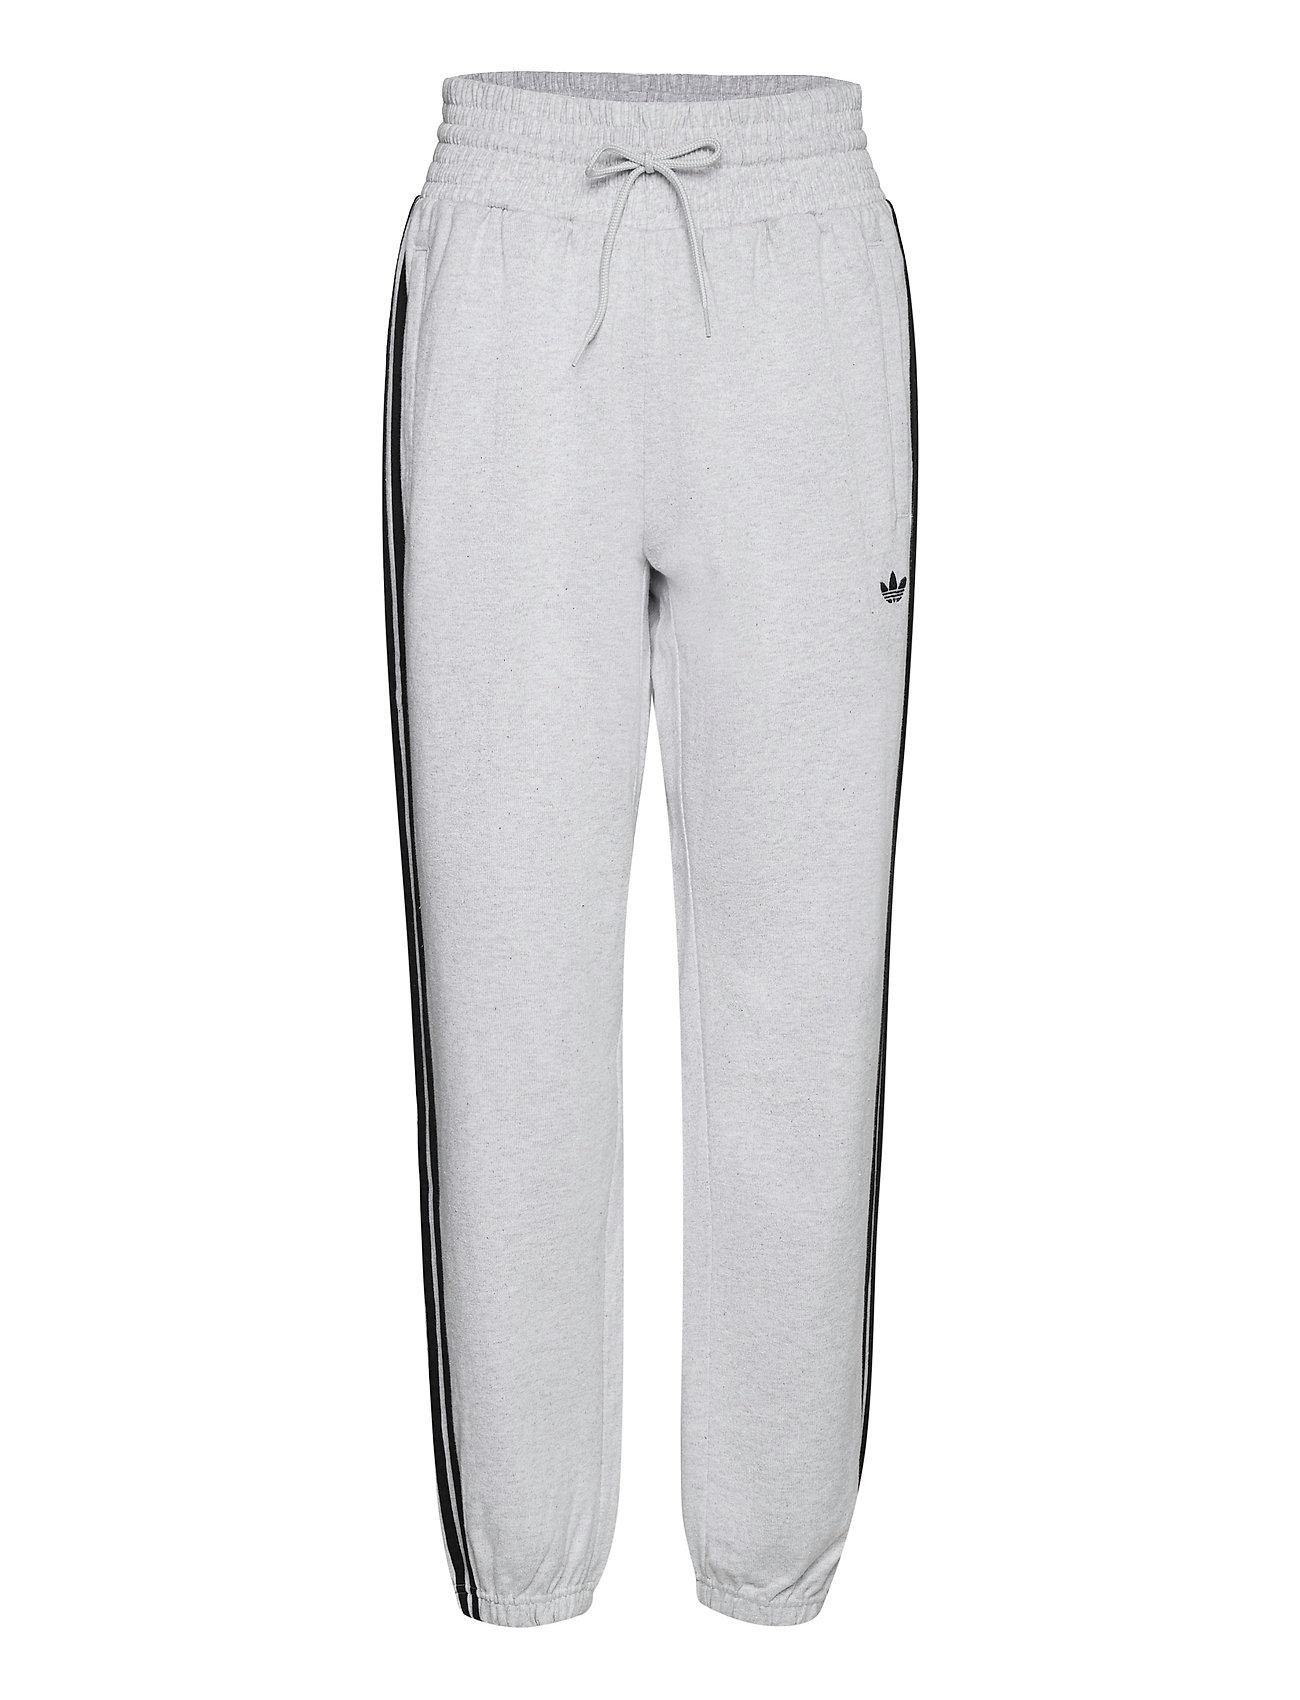 Smocked Waist Cuffed Pants W Sweatpants Hyggebukser Grå Adidas Originals